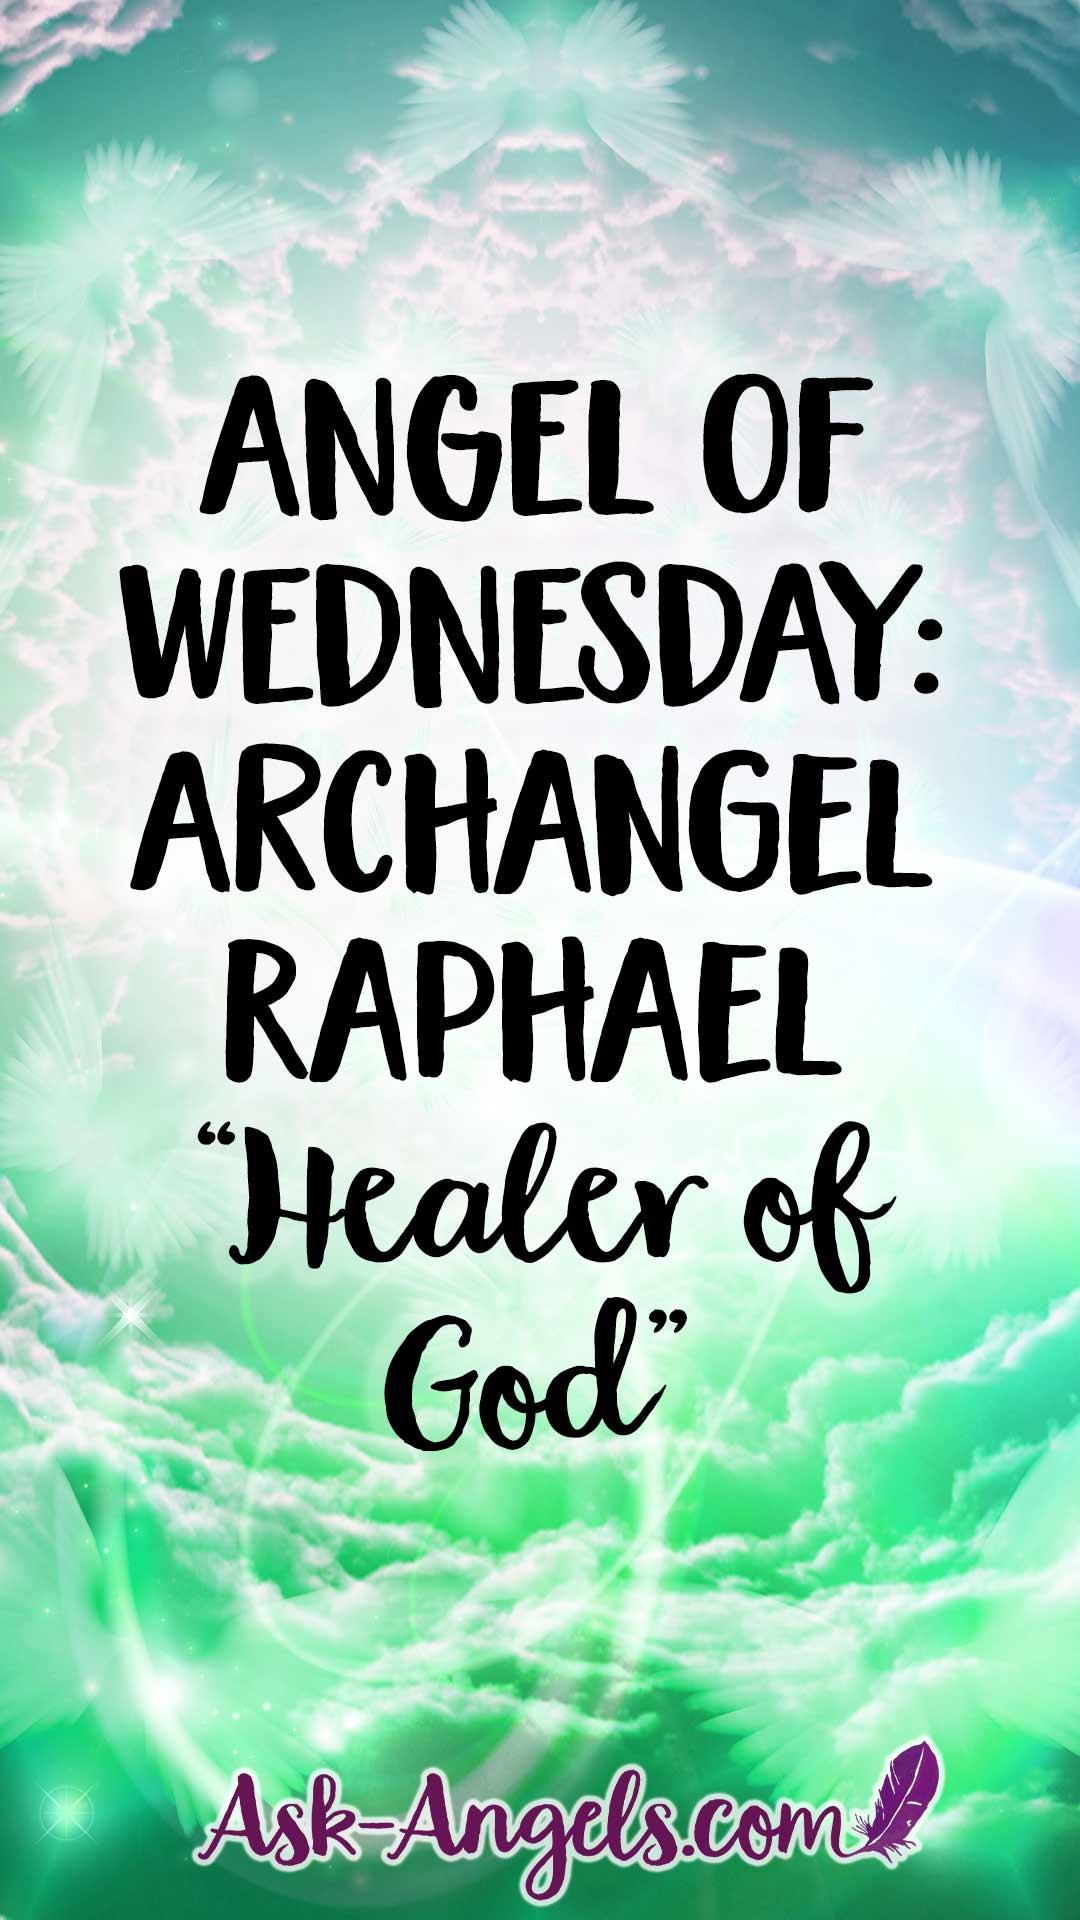 Angel of Wednesday - Archangel Raphael - Healer of God